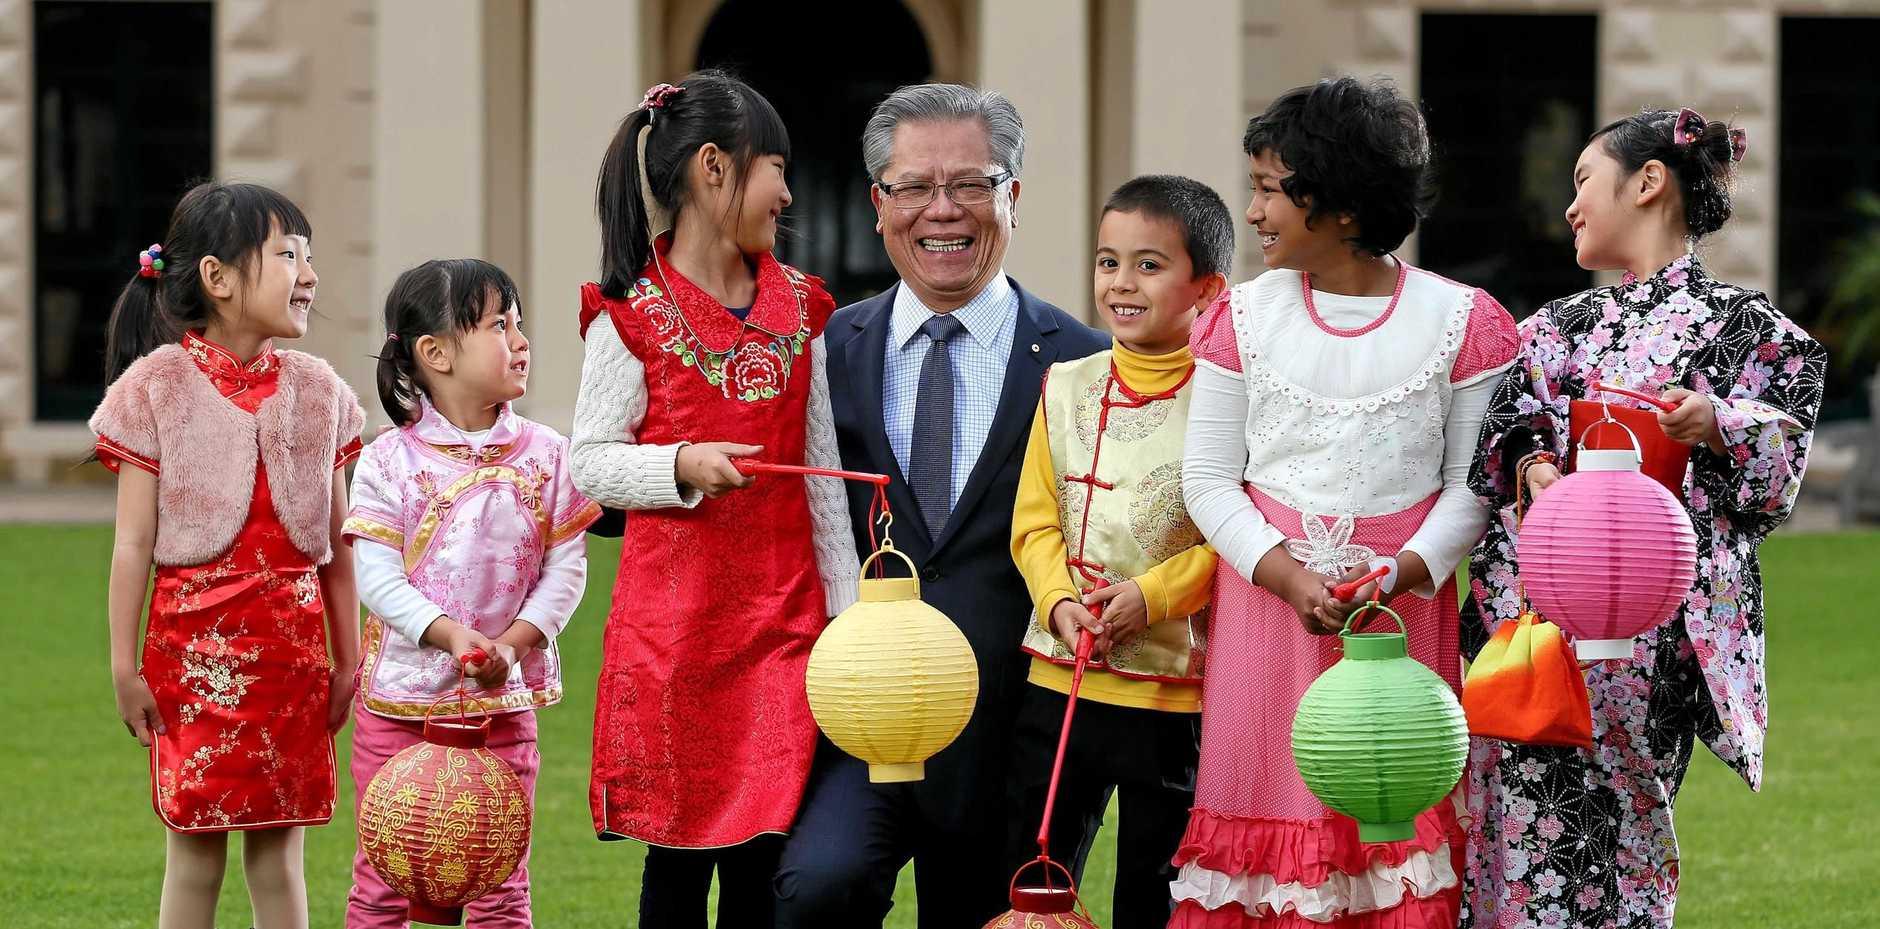 South Australian Governor and Patron of OzAsia Festival Mr Le with Tina Wang, Rui Love, Alice Li, Tian Love, Payel Rahman and Kylie Oyama.